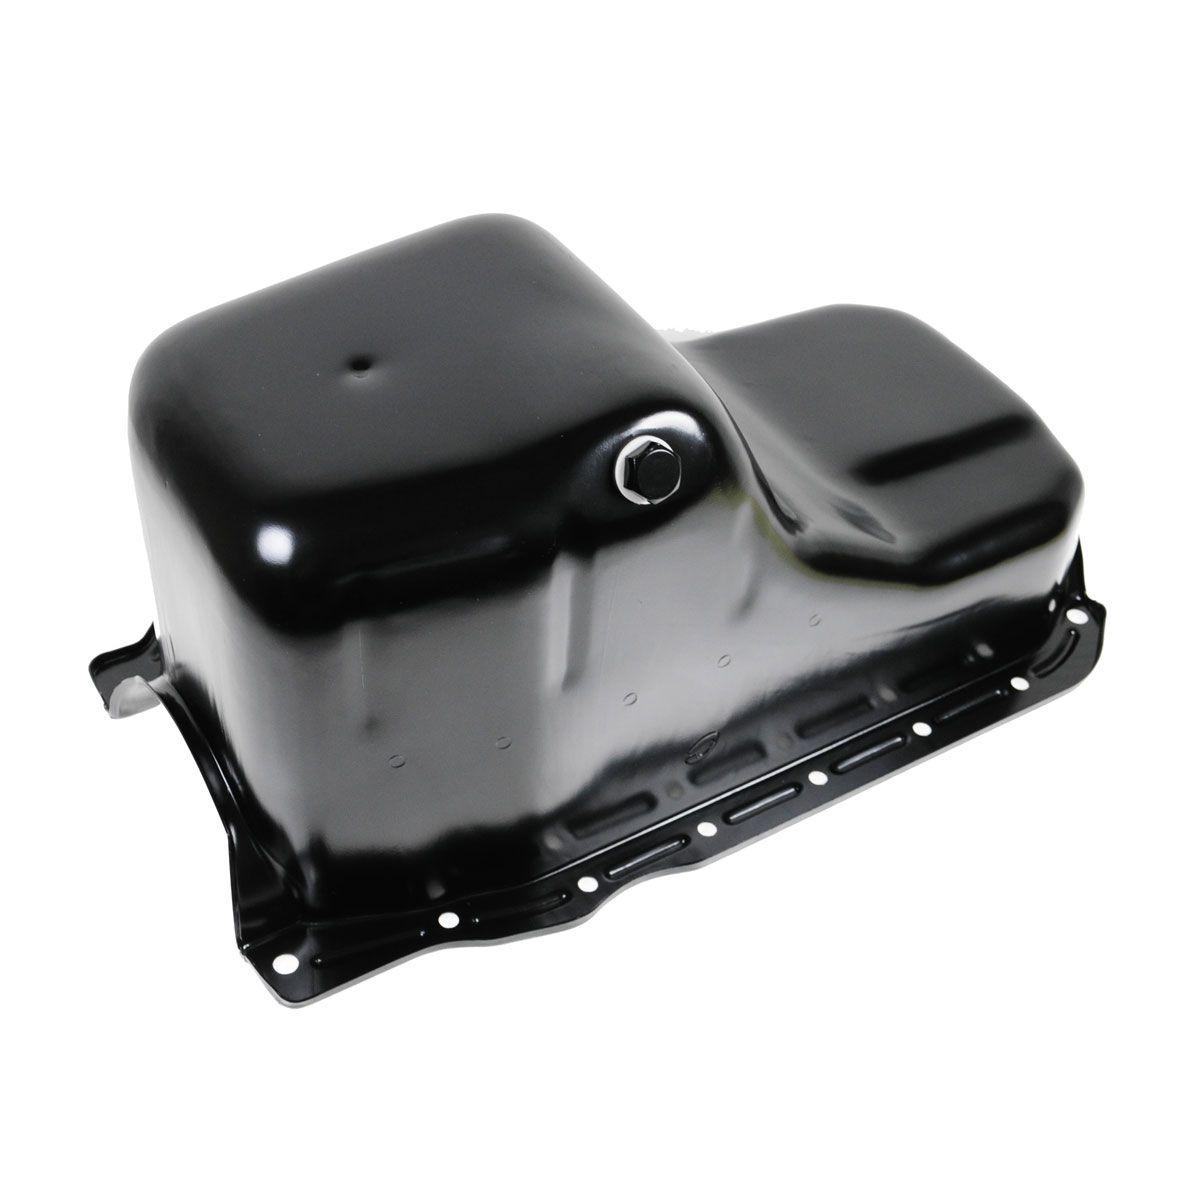 Oil Pan For Chevy GMC C/K 10 1500 2500 3500 Pickup Truck